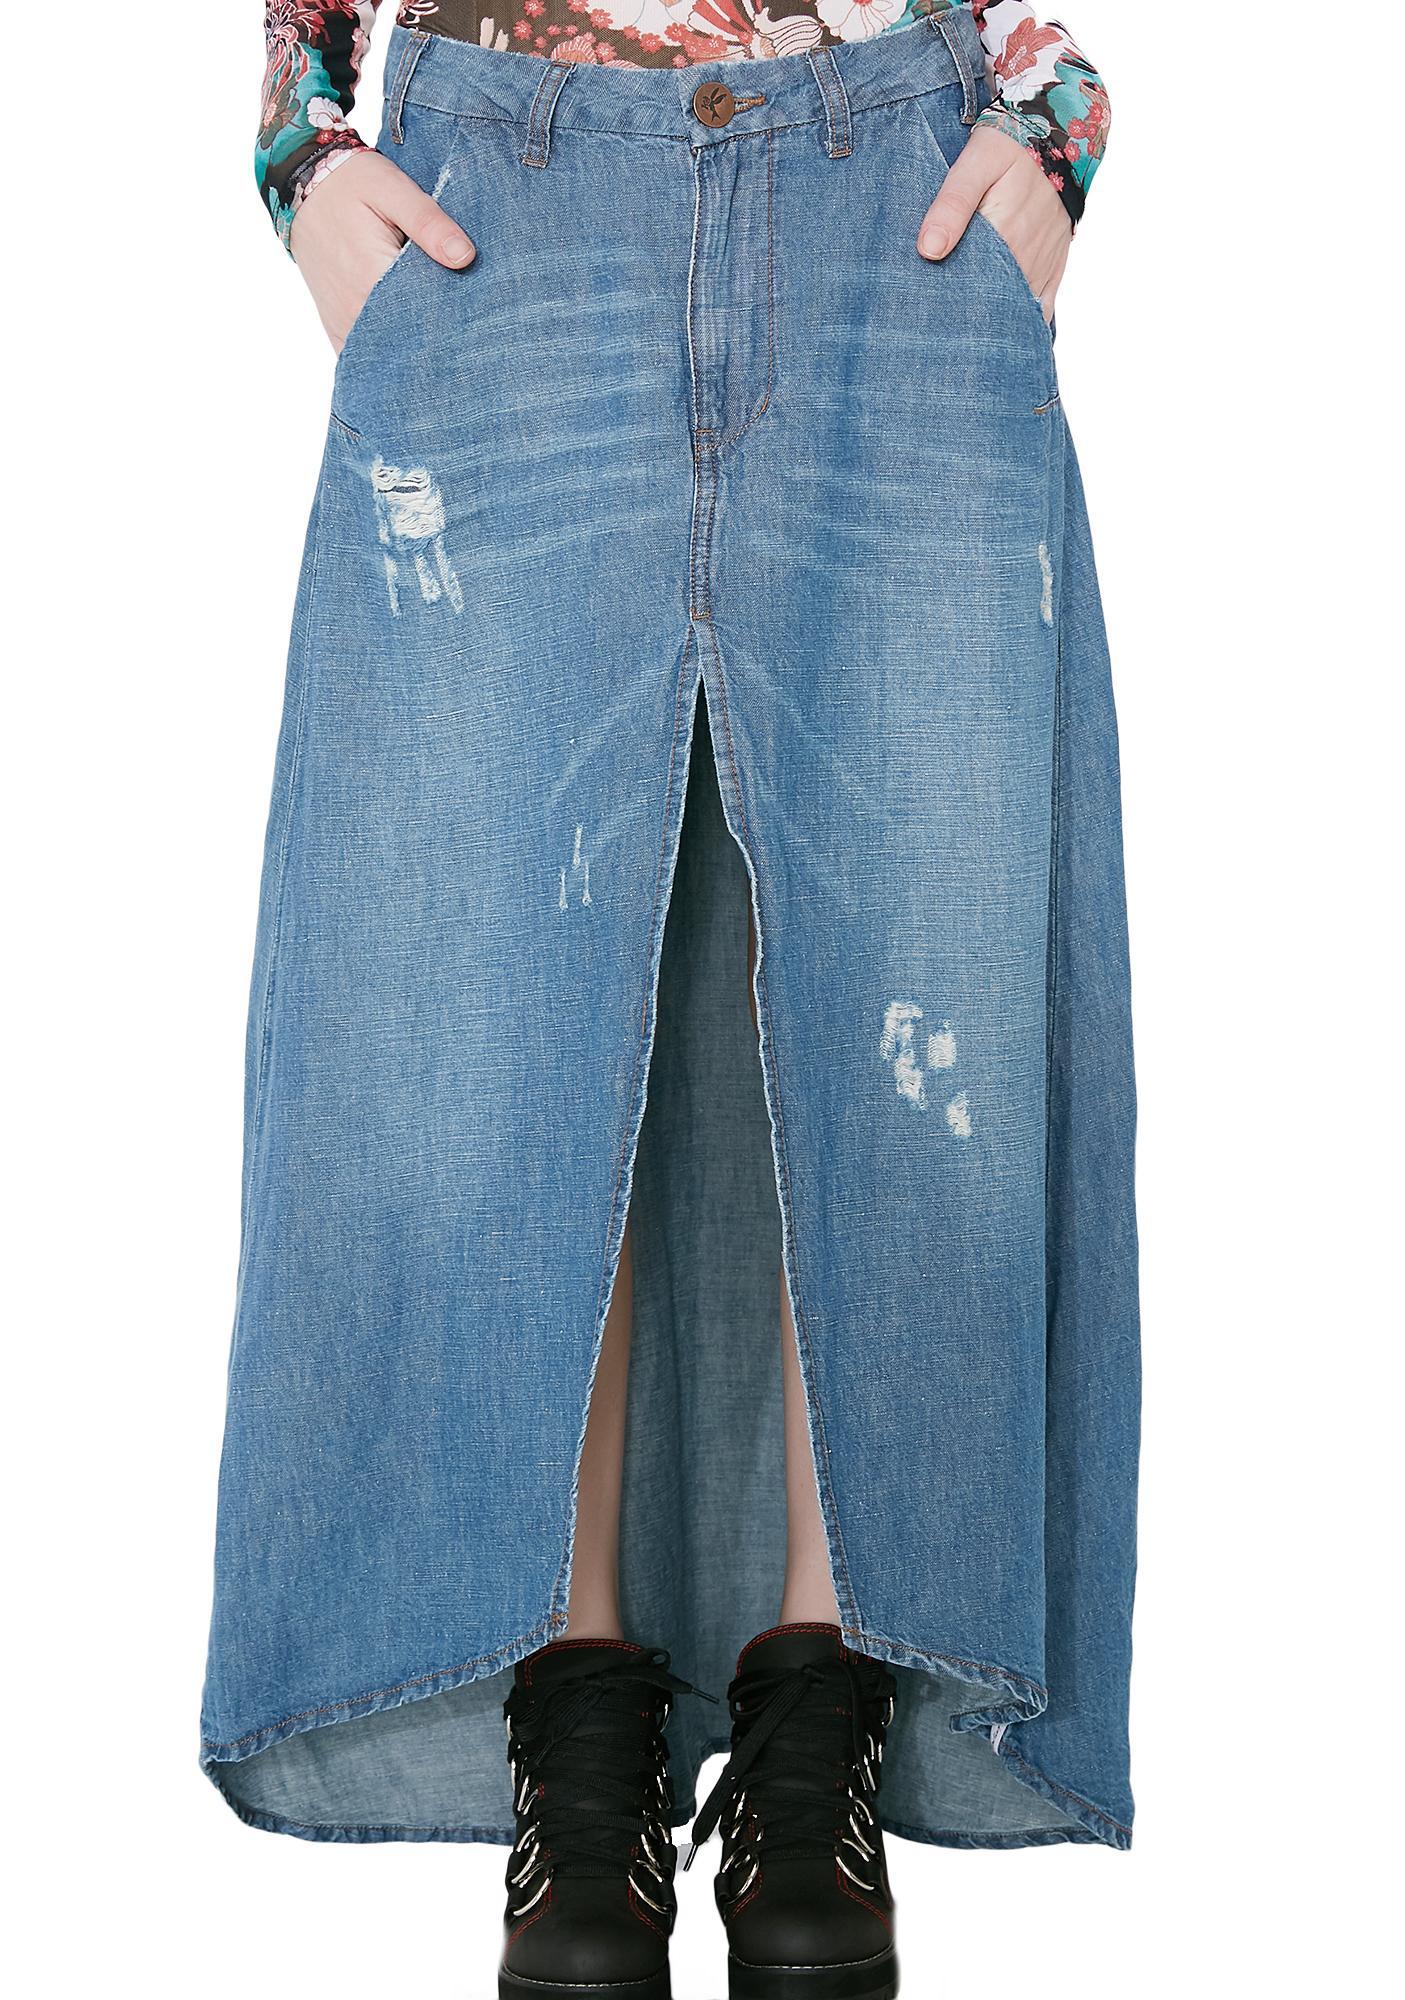 One Teaspoon California Blue Mrs. Carter Skirt